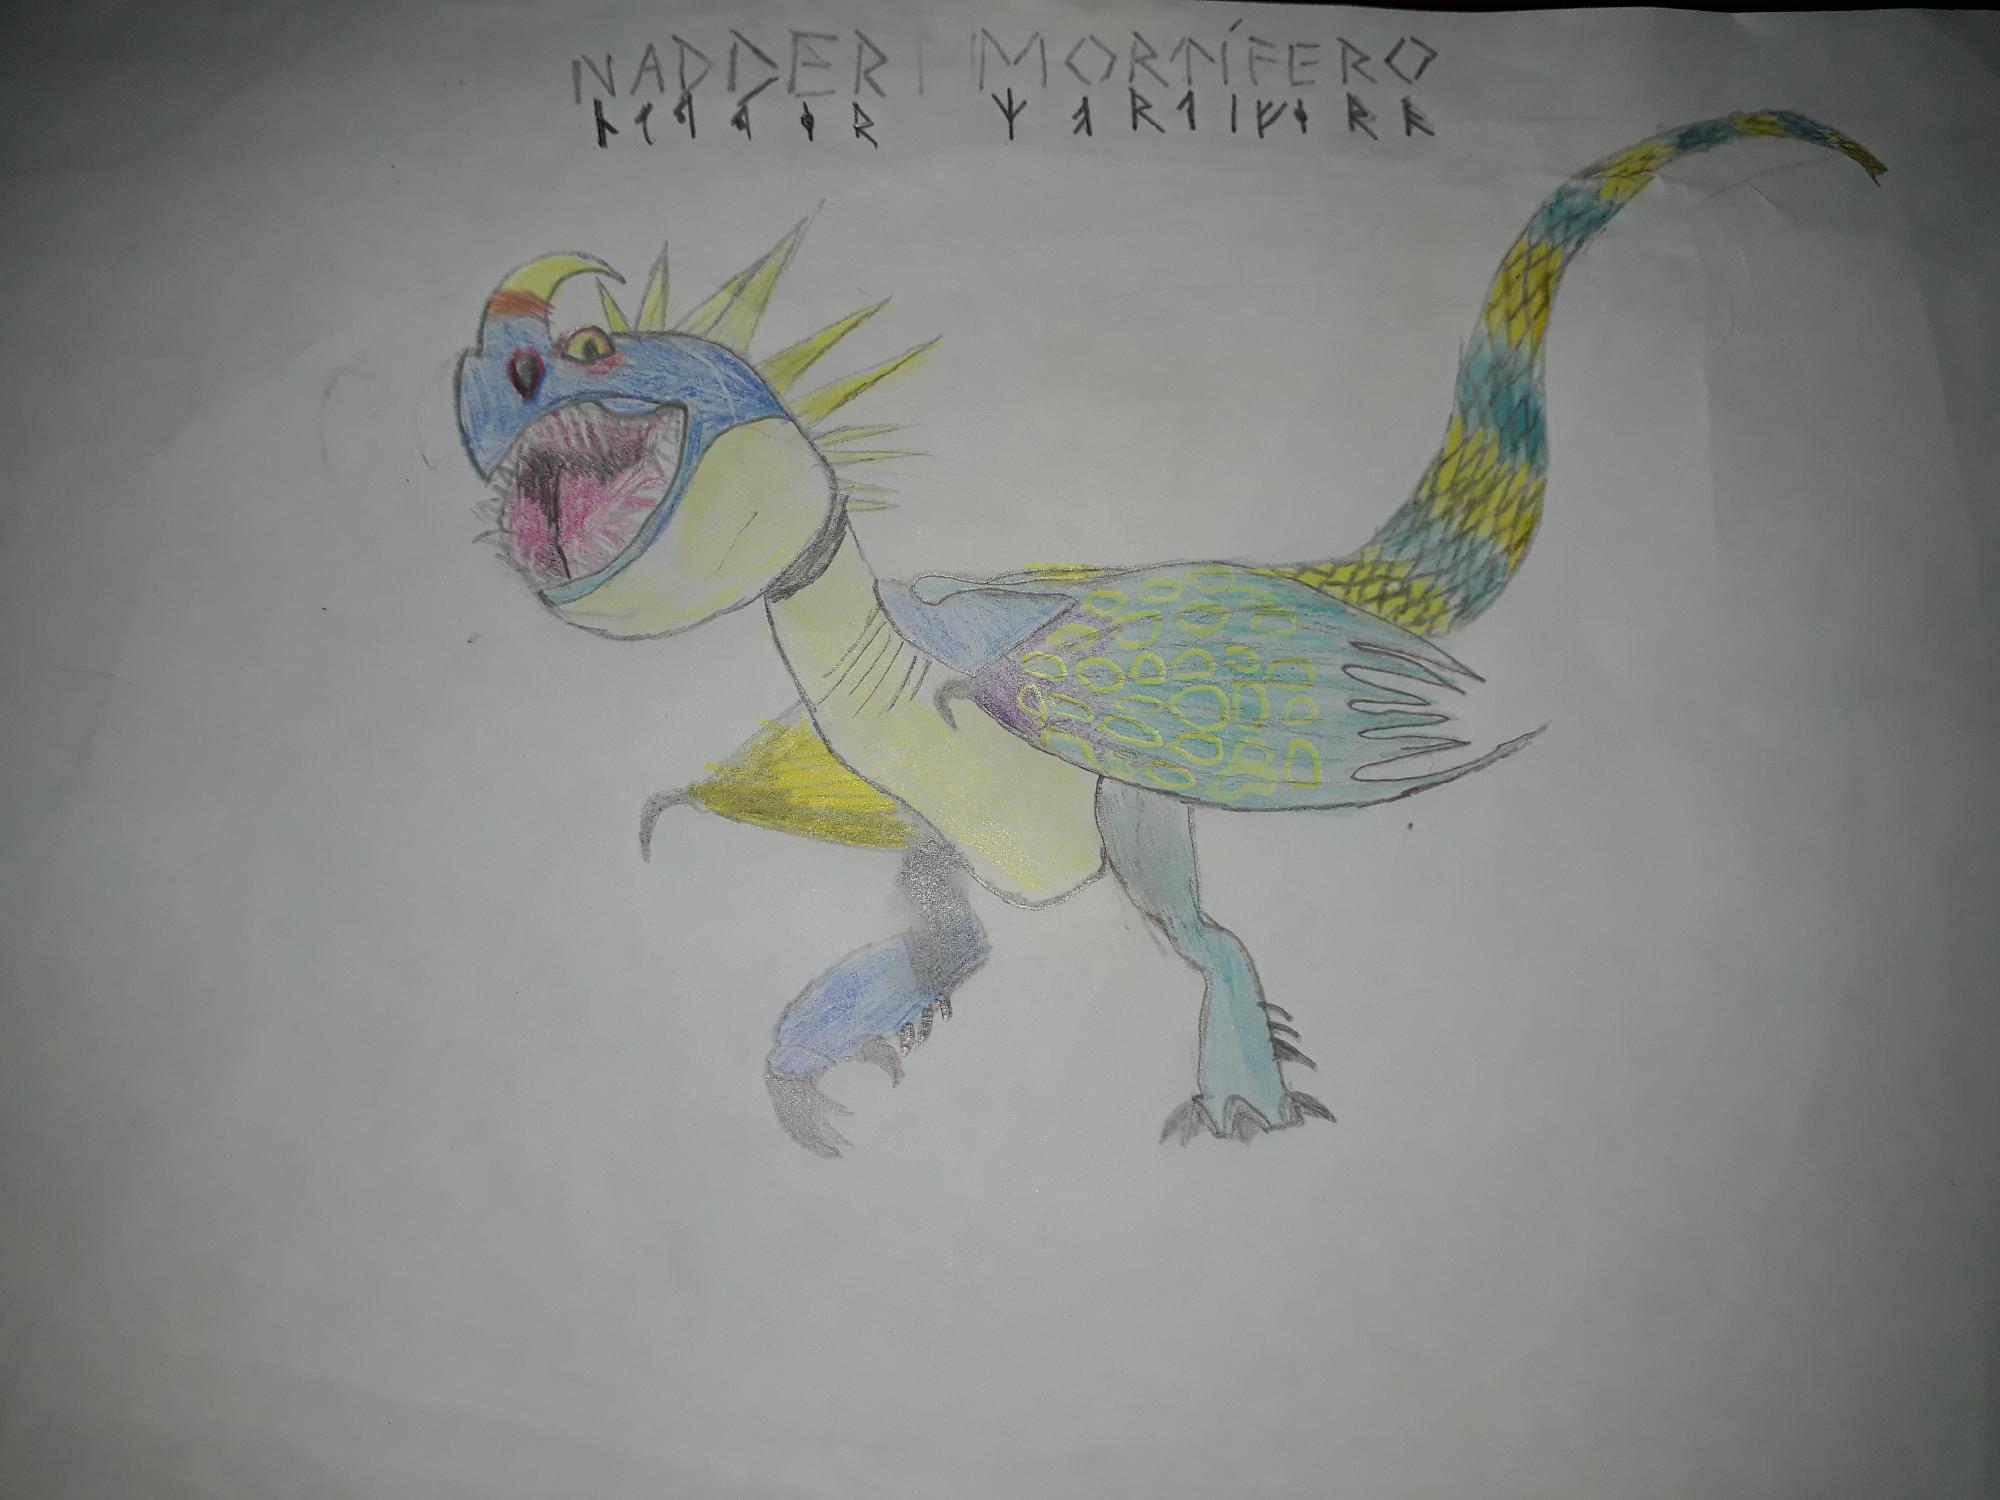 Dragon #6 (nadder mortifero)